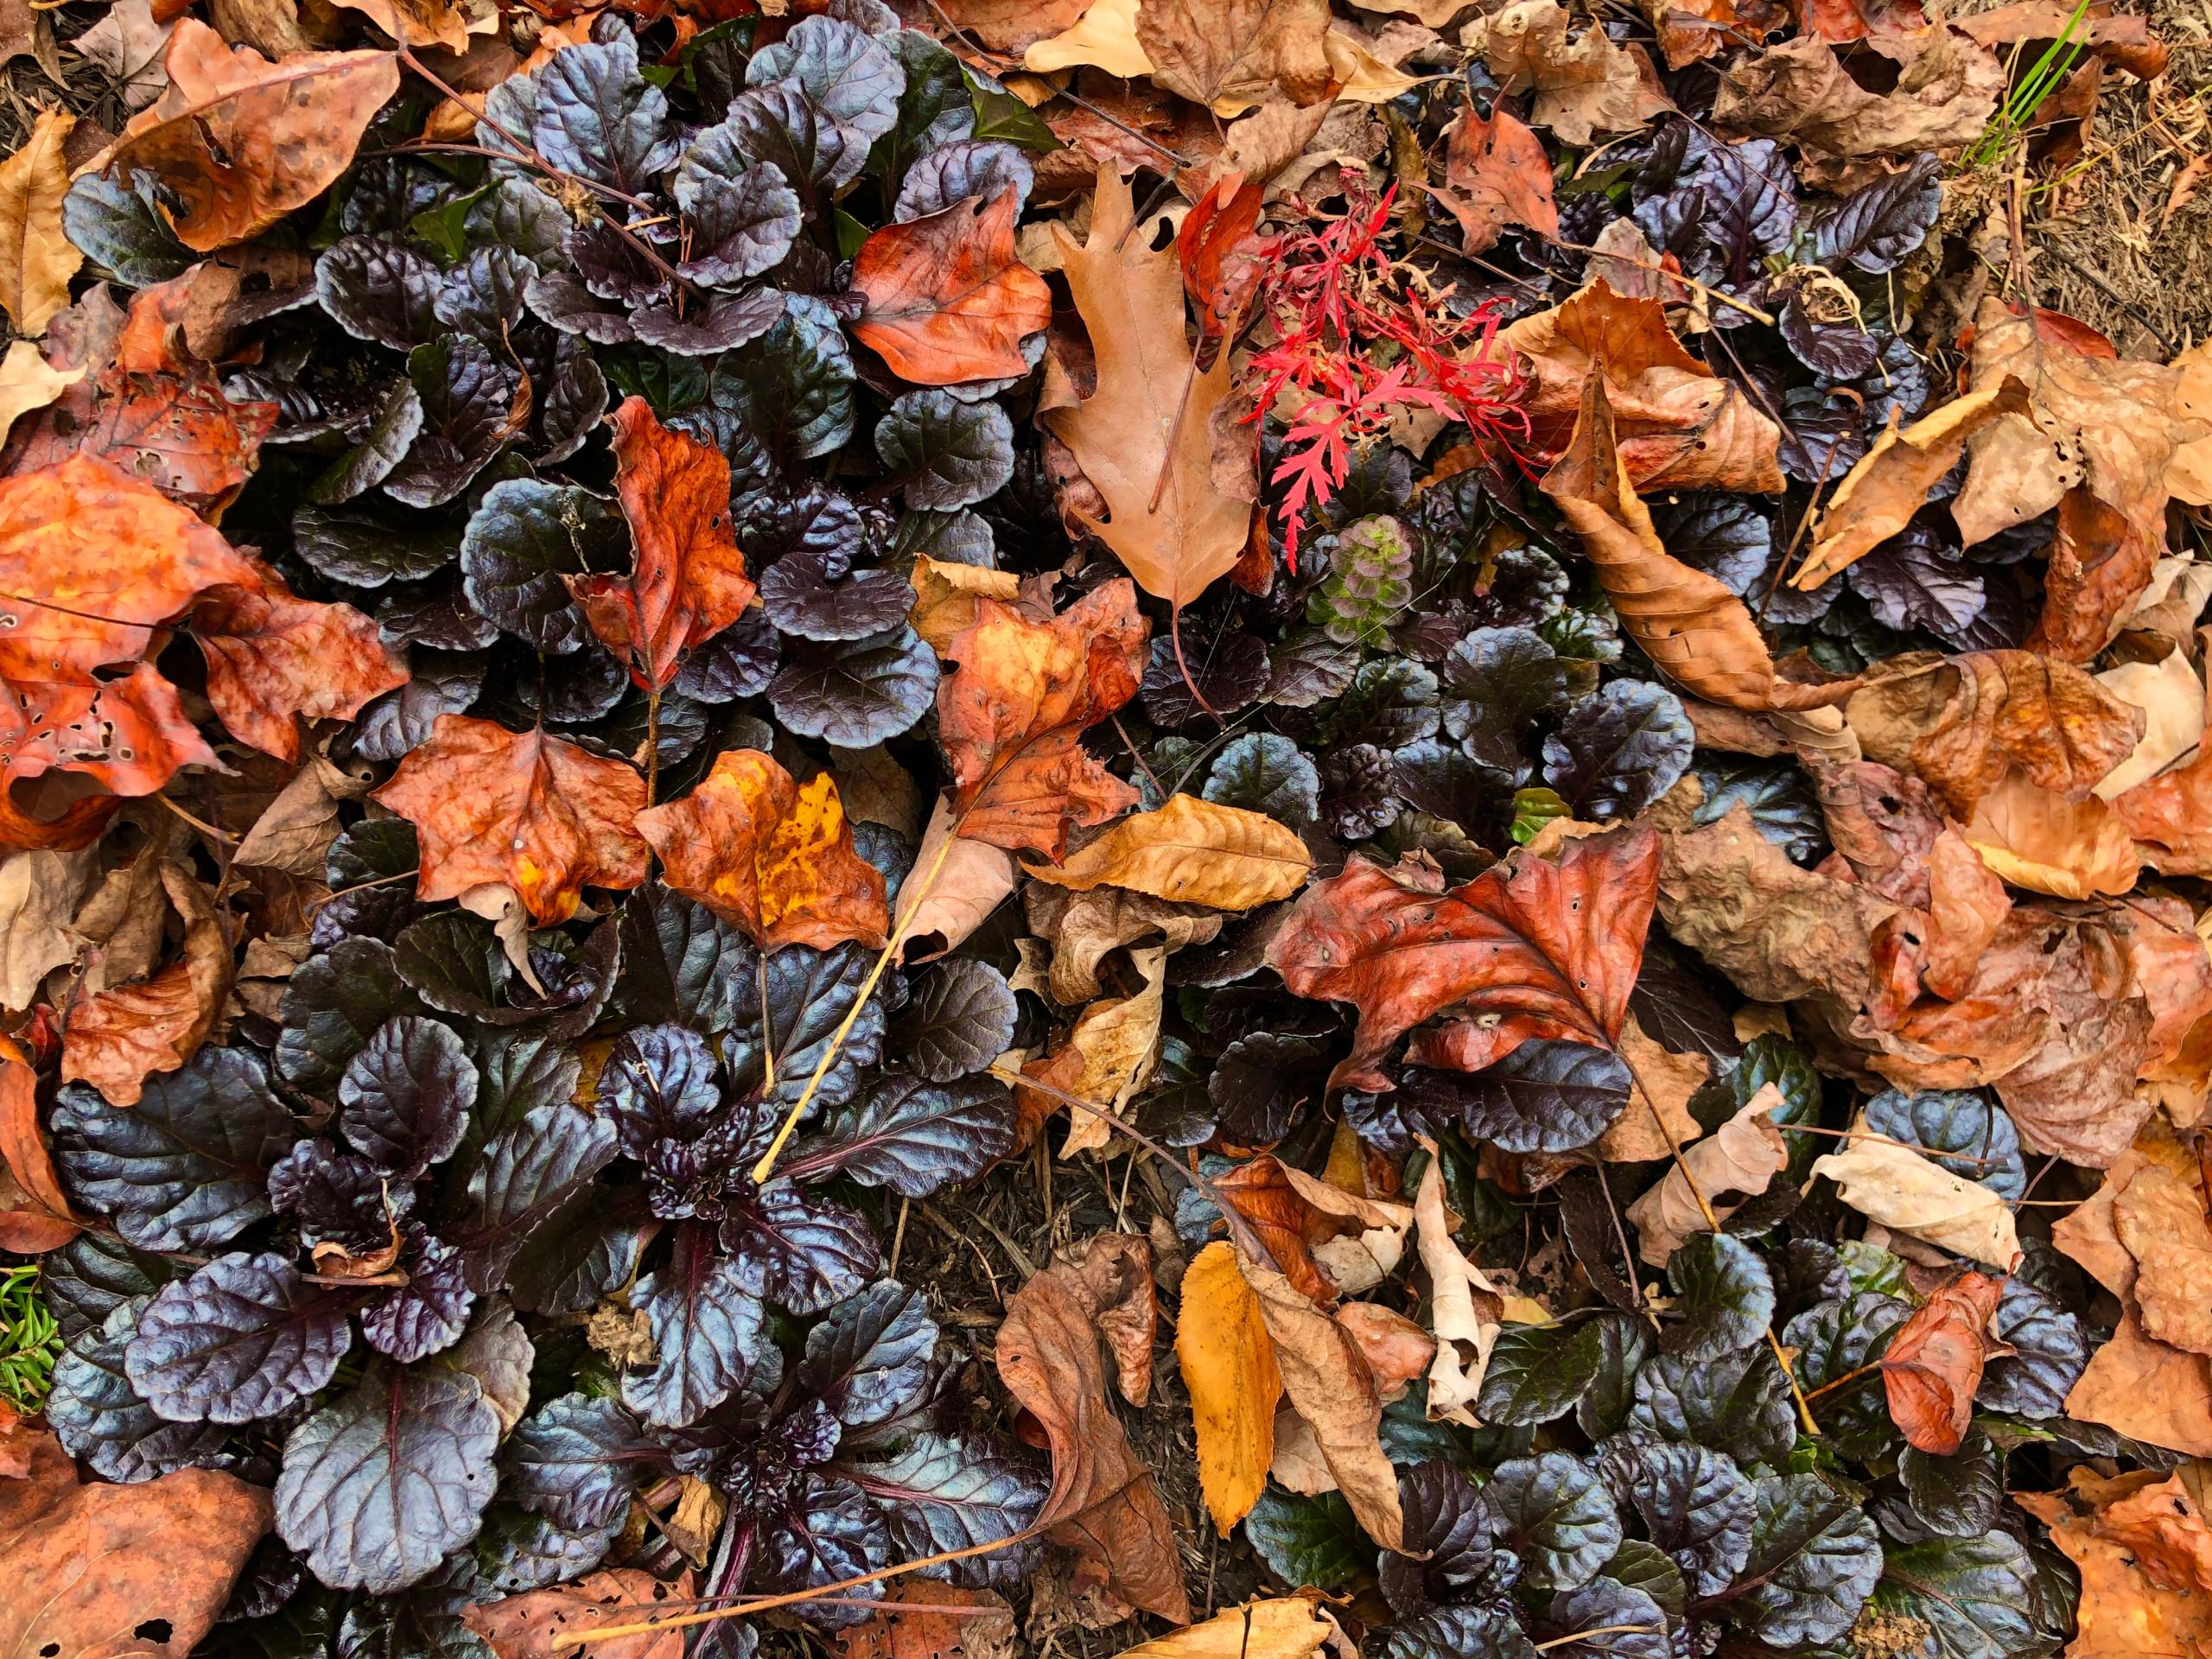 'Black Scallop' ajuga meets fallen leaves